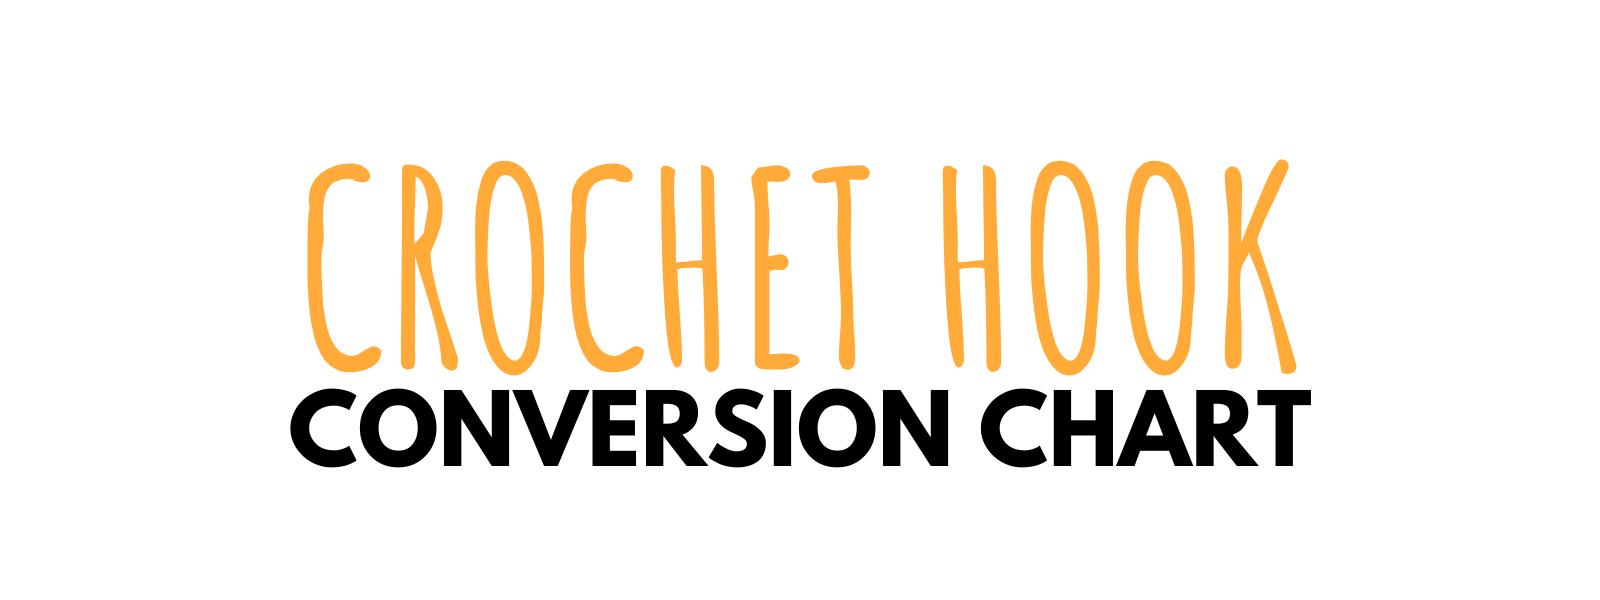 Crochet Hook Conversion Chart – Printable Pdf - Don'T Be